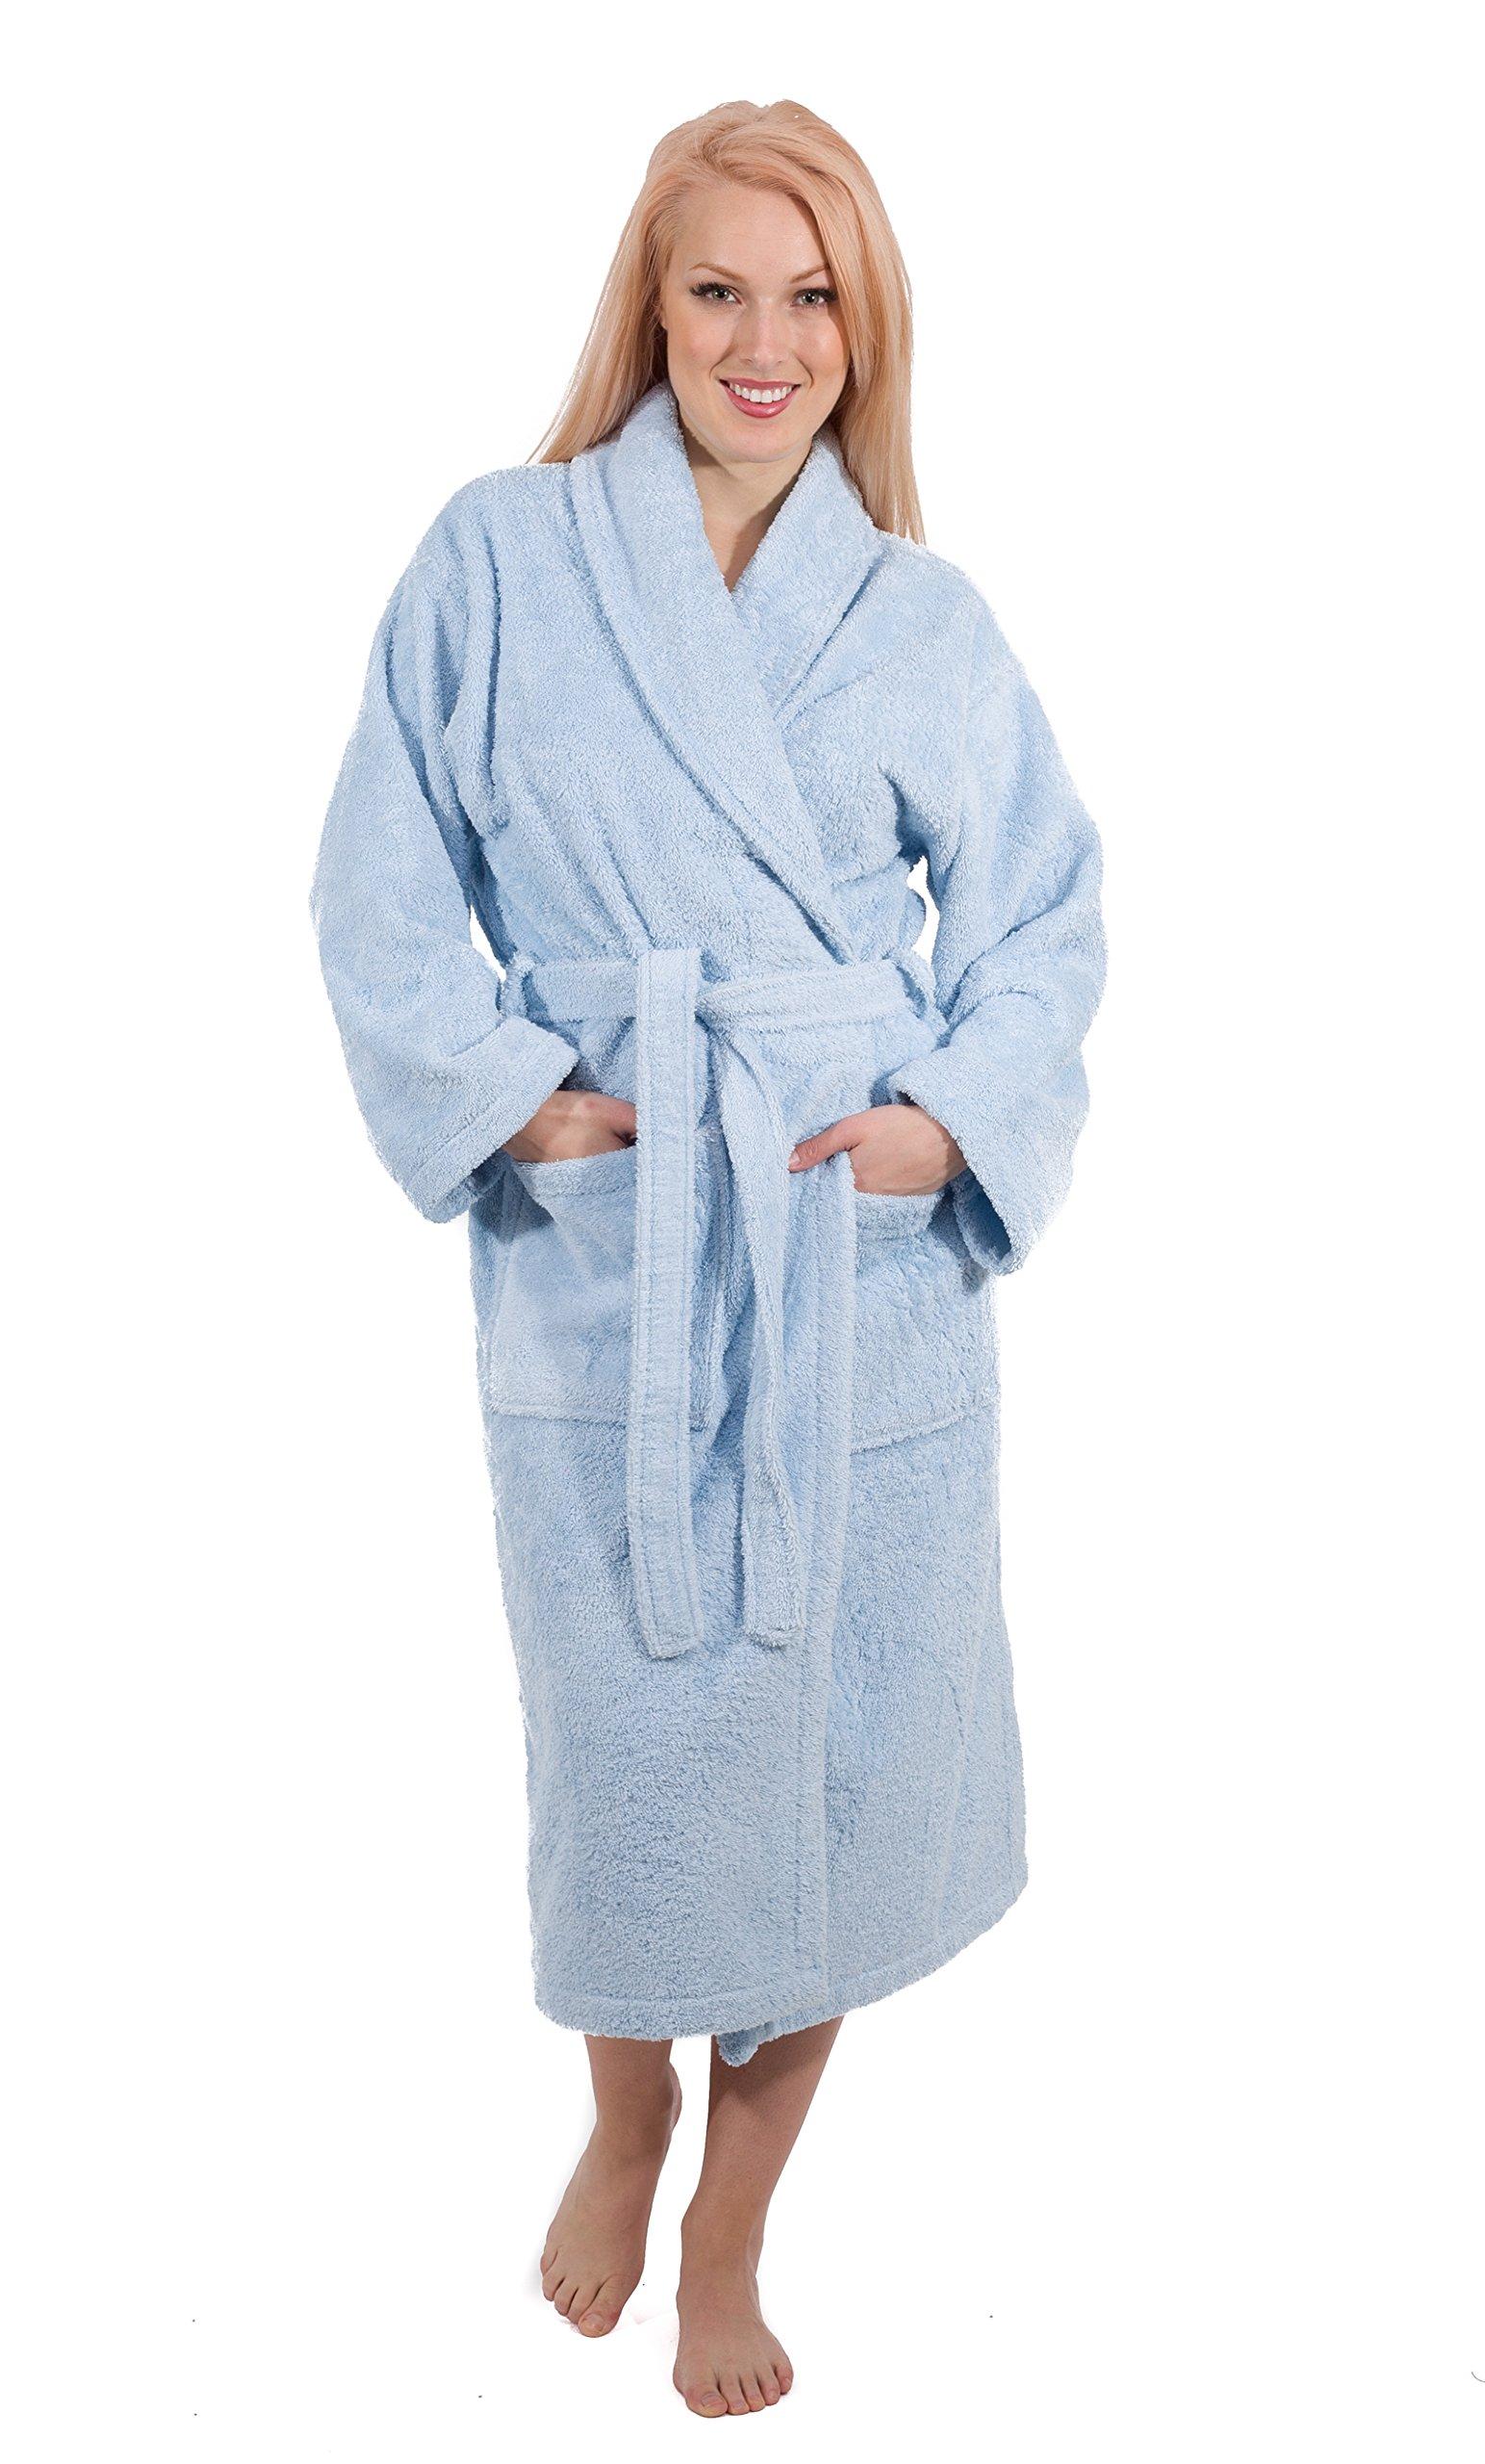 Luxury Terry Cloth Hotel Bathrobe - Premium 100% Turkish Cotton Robe Unisex (Small, Ice Blue)